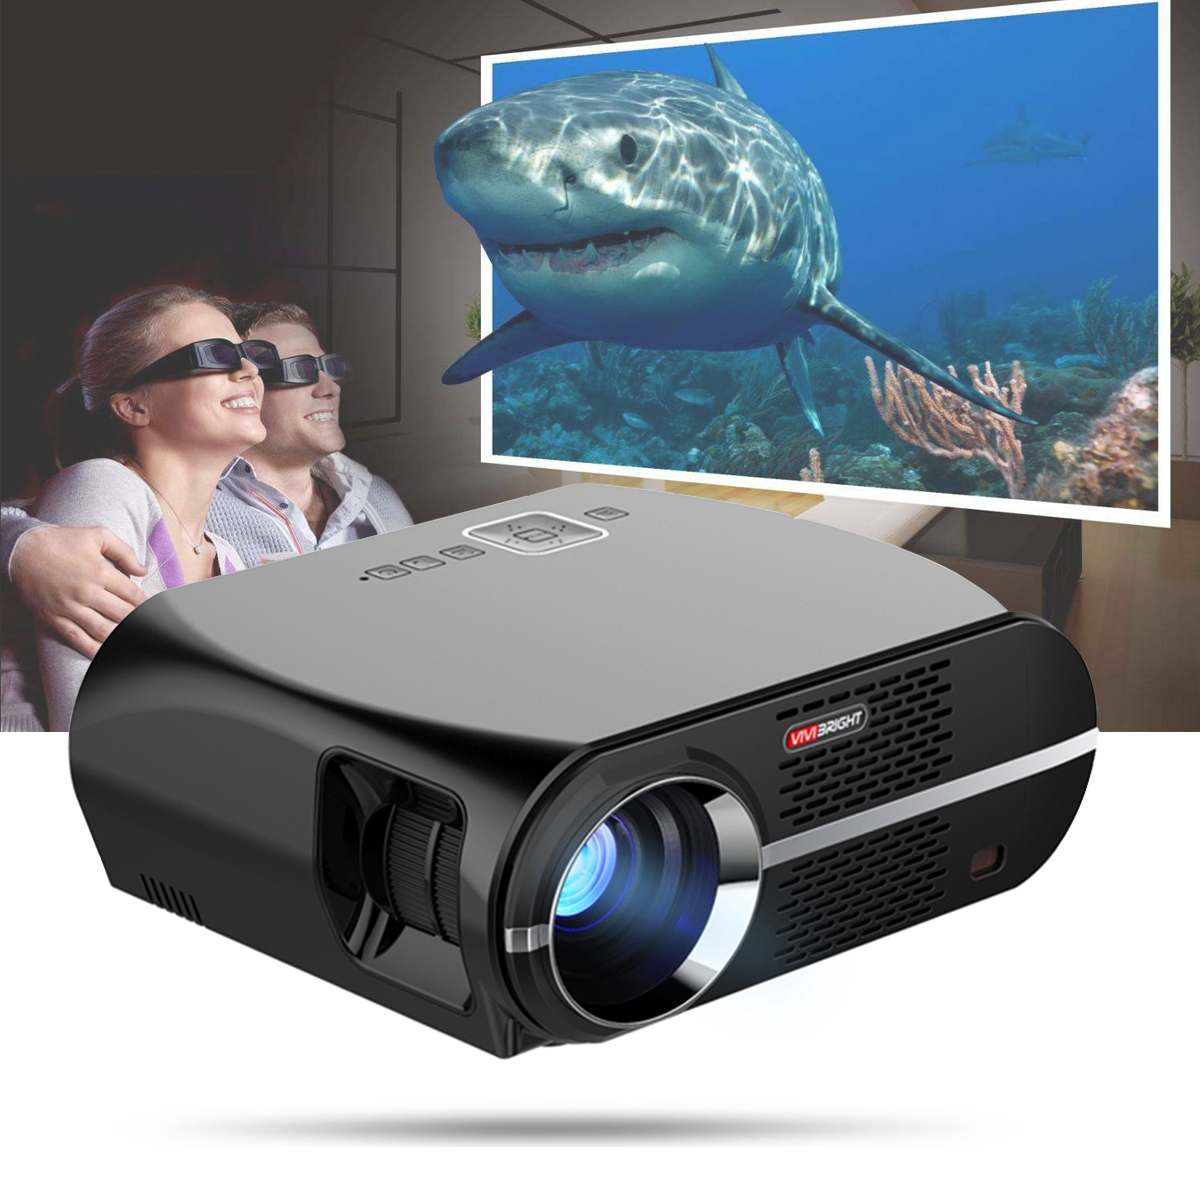 Vivibright gp100up hd android projetor 4k wifi bluetooth inteligente led 3500 lumens 1280*800p 1080p casa teatro amlogic s905x